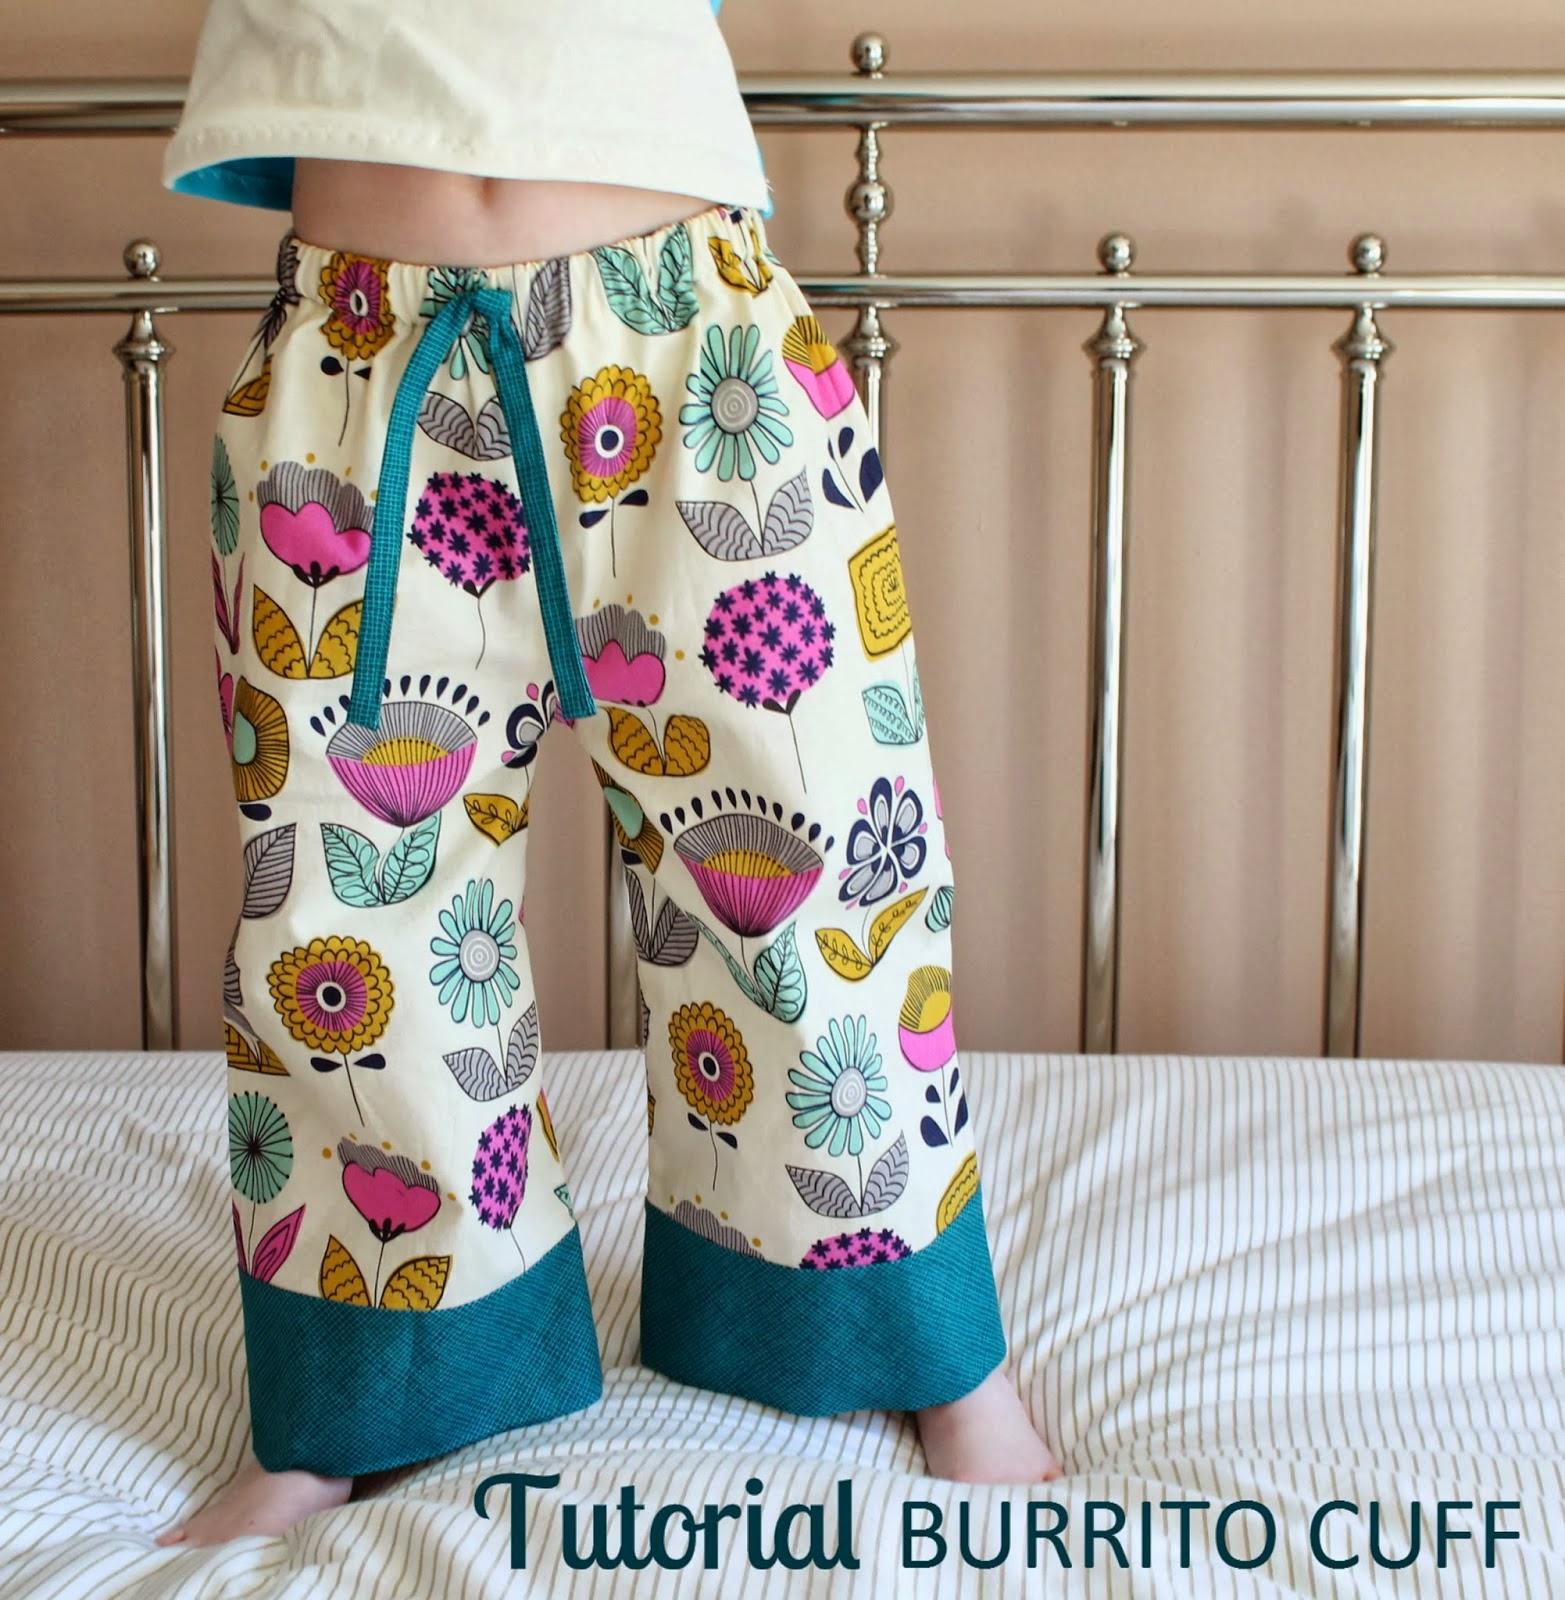 http://theinspiredwren.blogspot.com/2014/02/tutorial-burrito-cuff-pj-pants.html